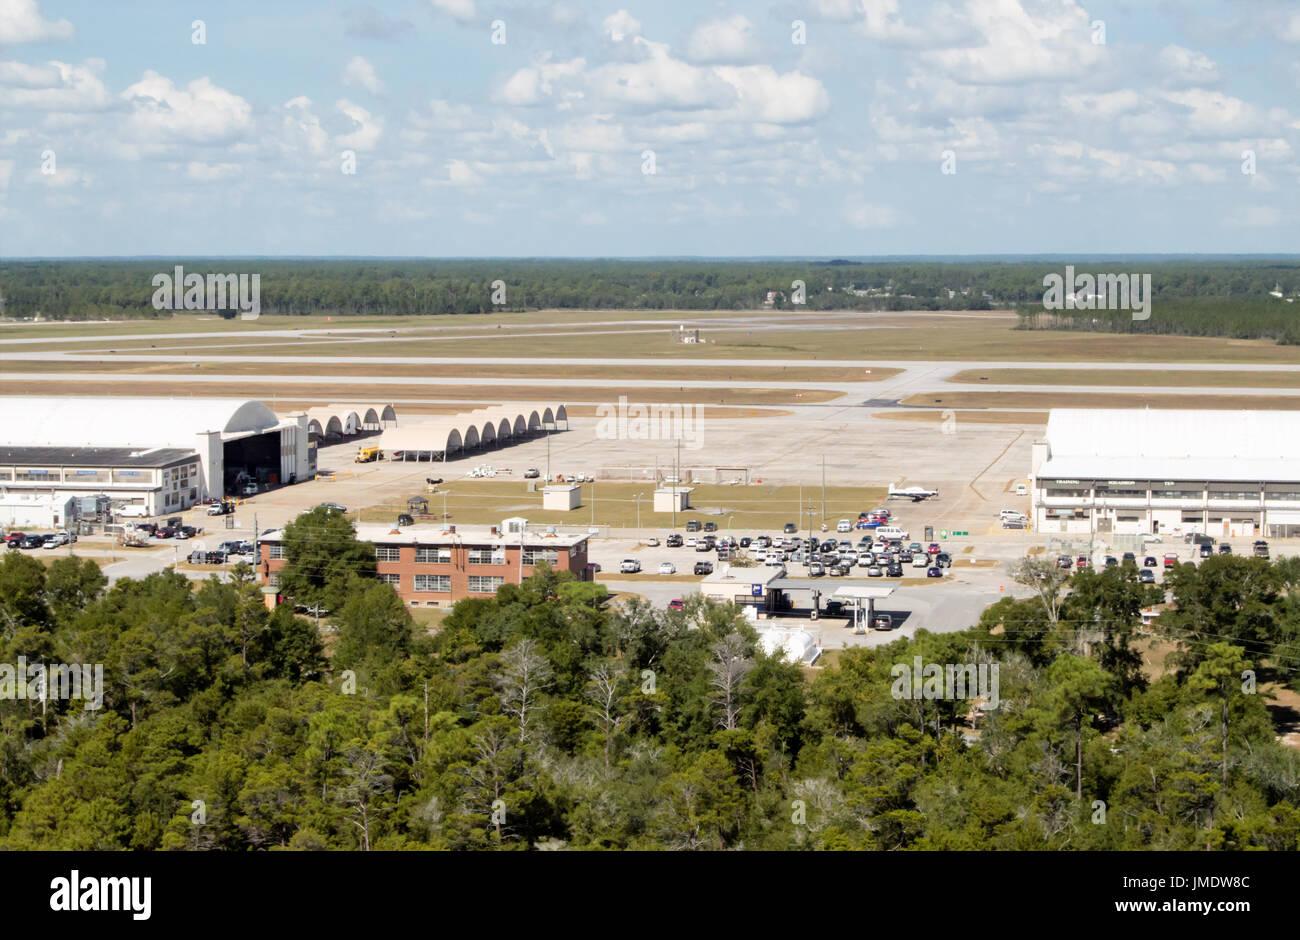 Luggage Storage Near Miami Airport